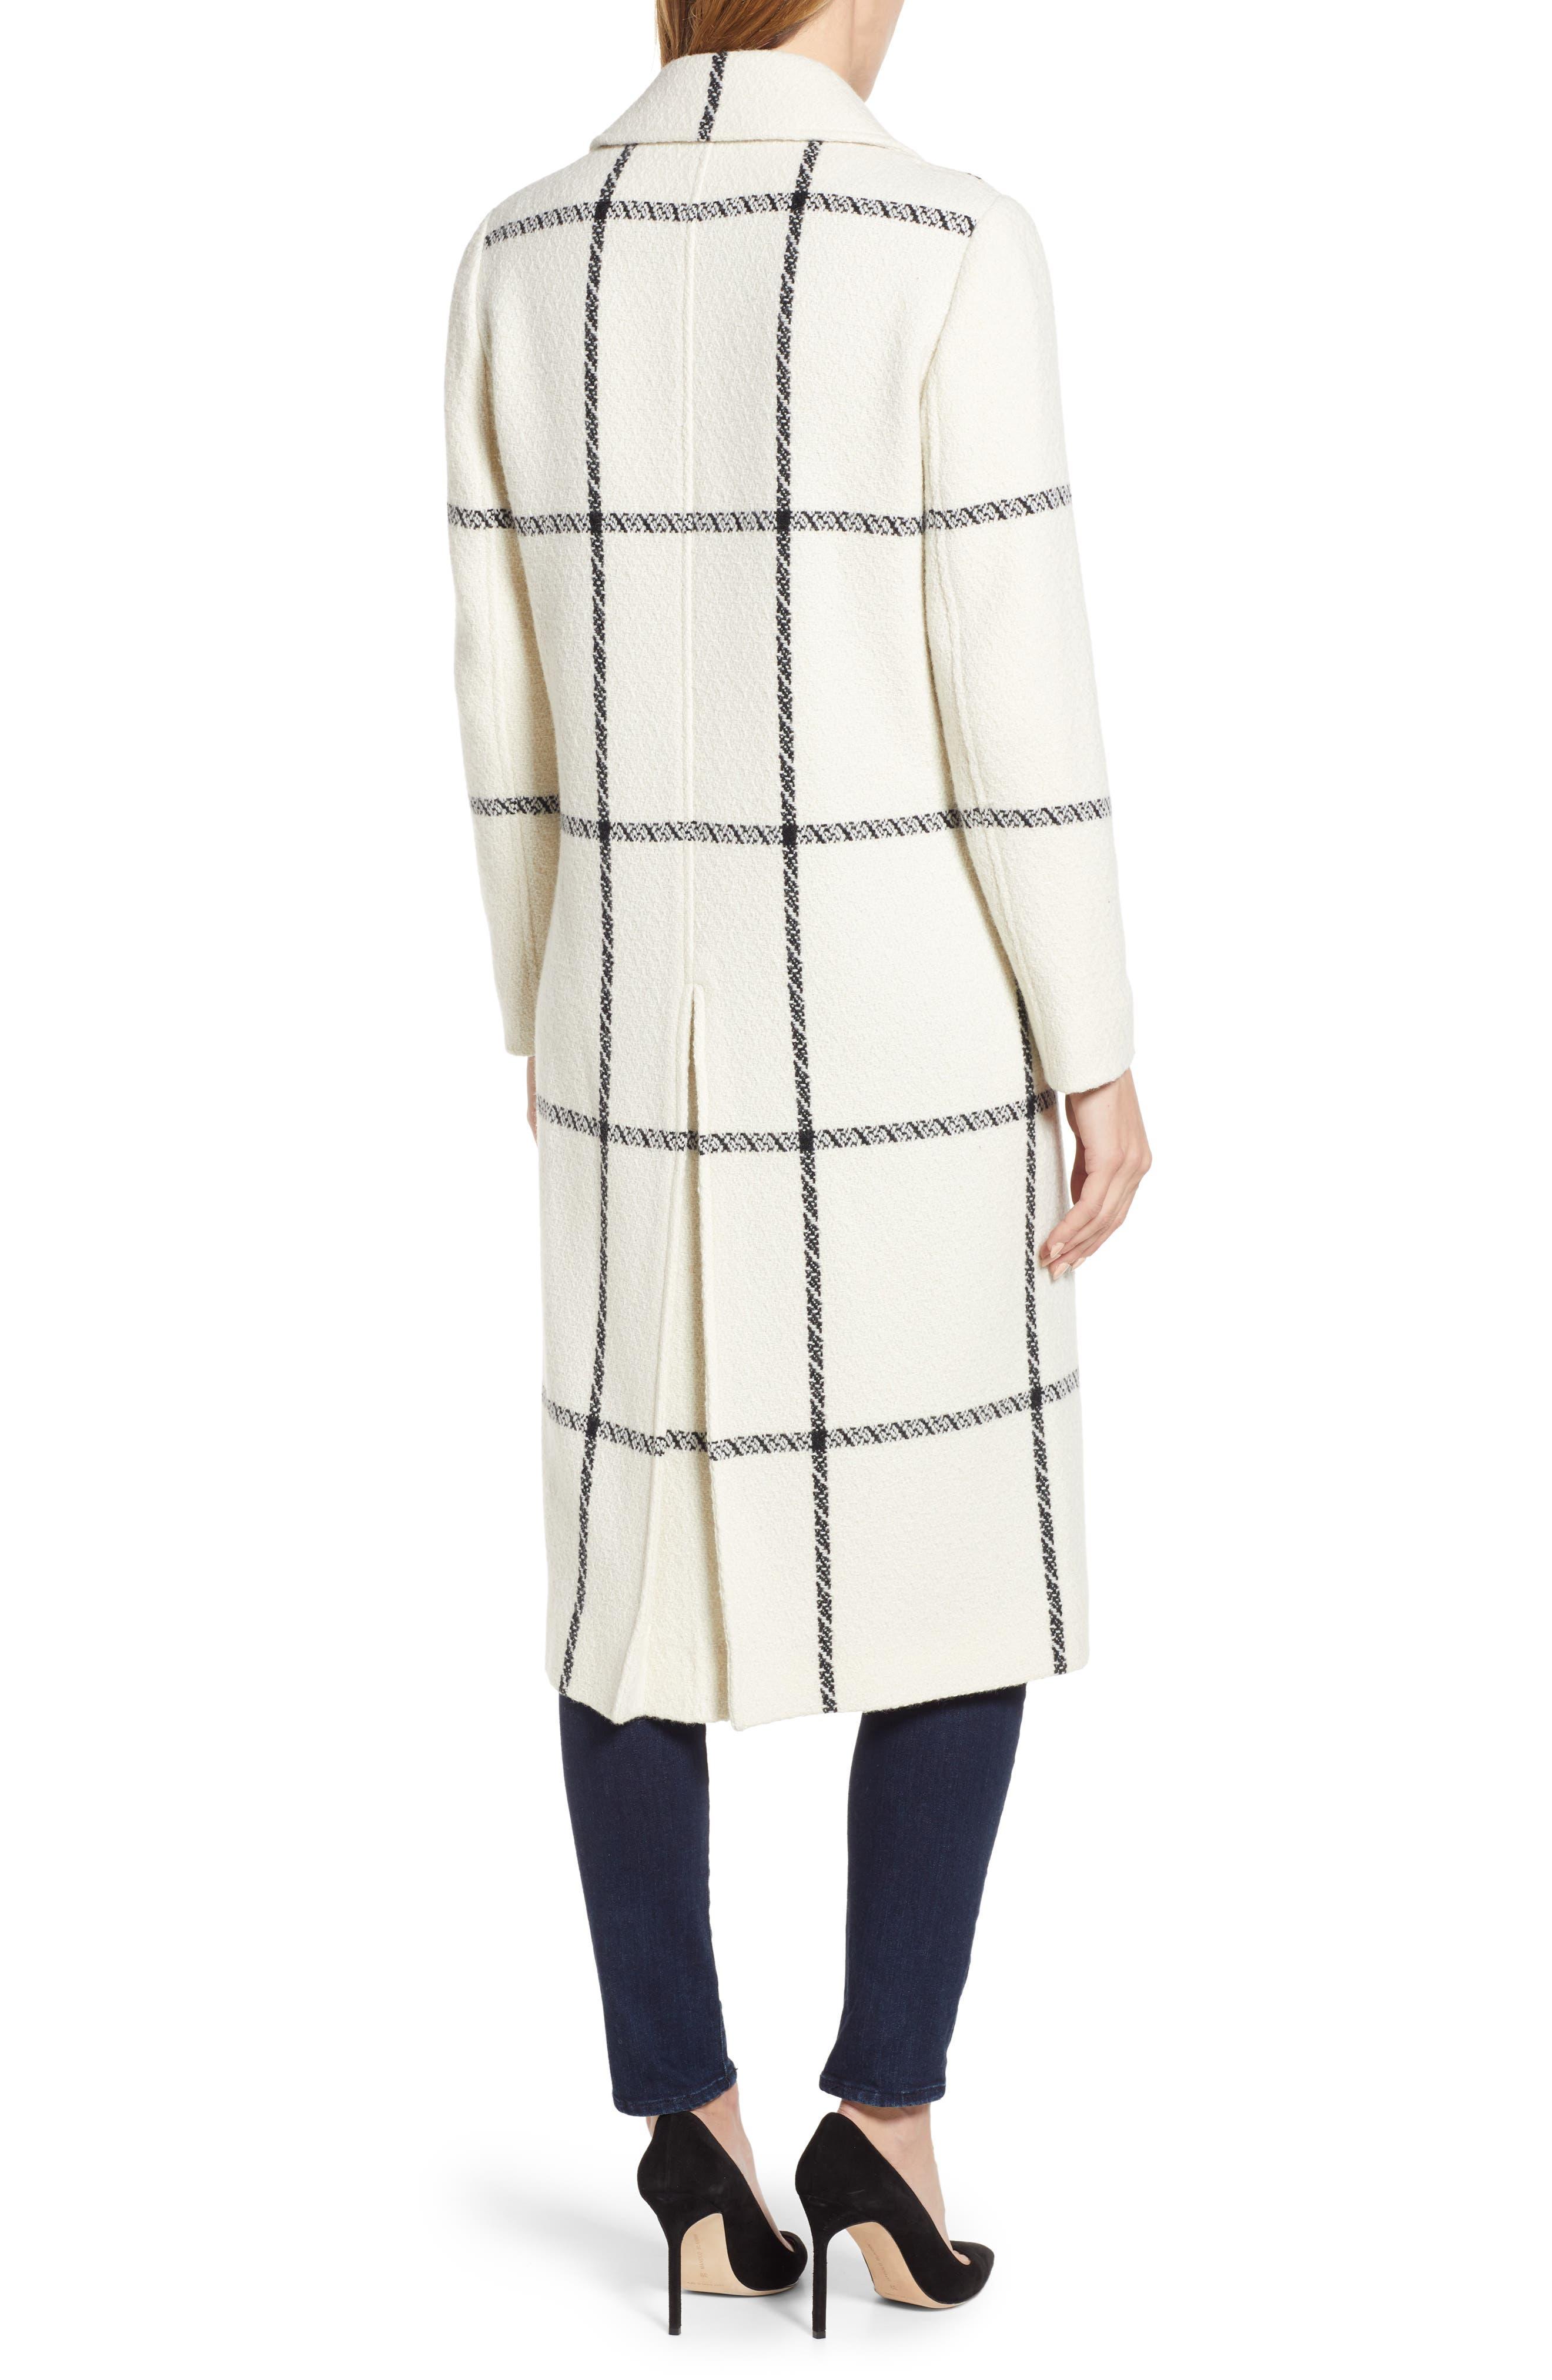 TED BAKER LONDON,                             Soniq Check Wool Blend Long Coat,                             Alternate thumbnail 2, color,                             92-IVORY